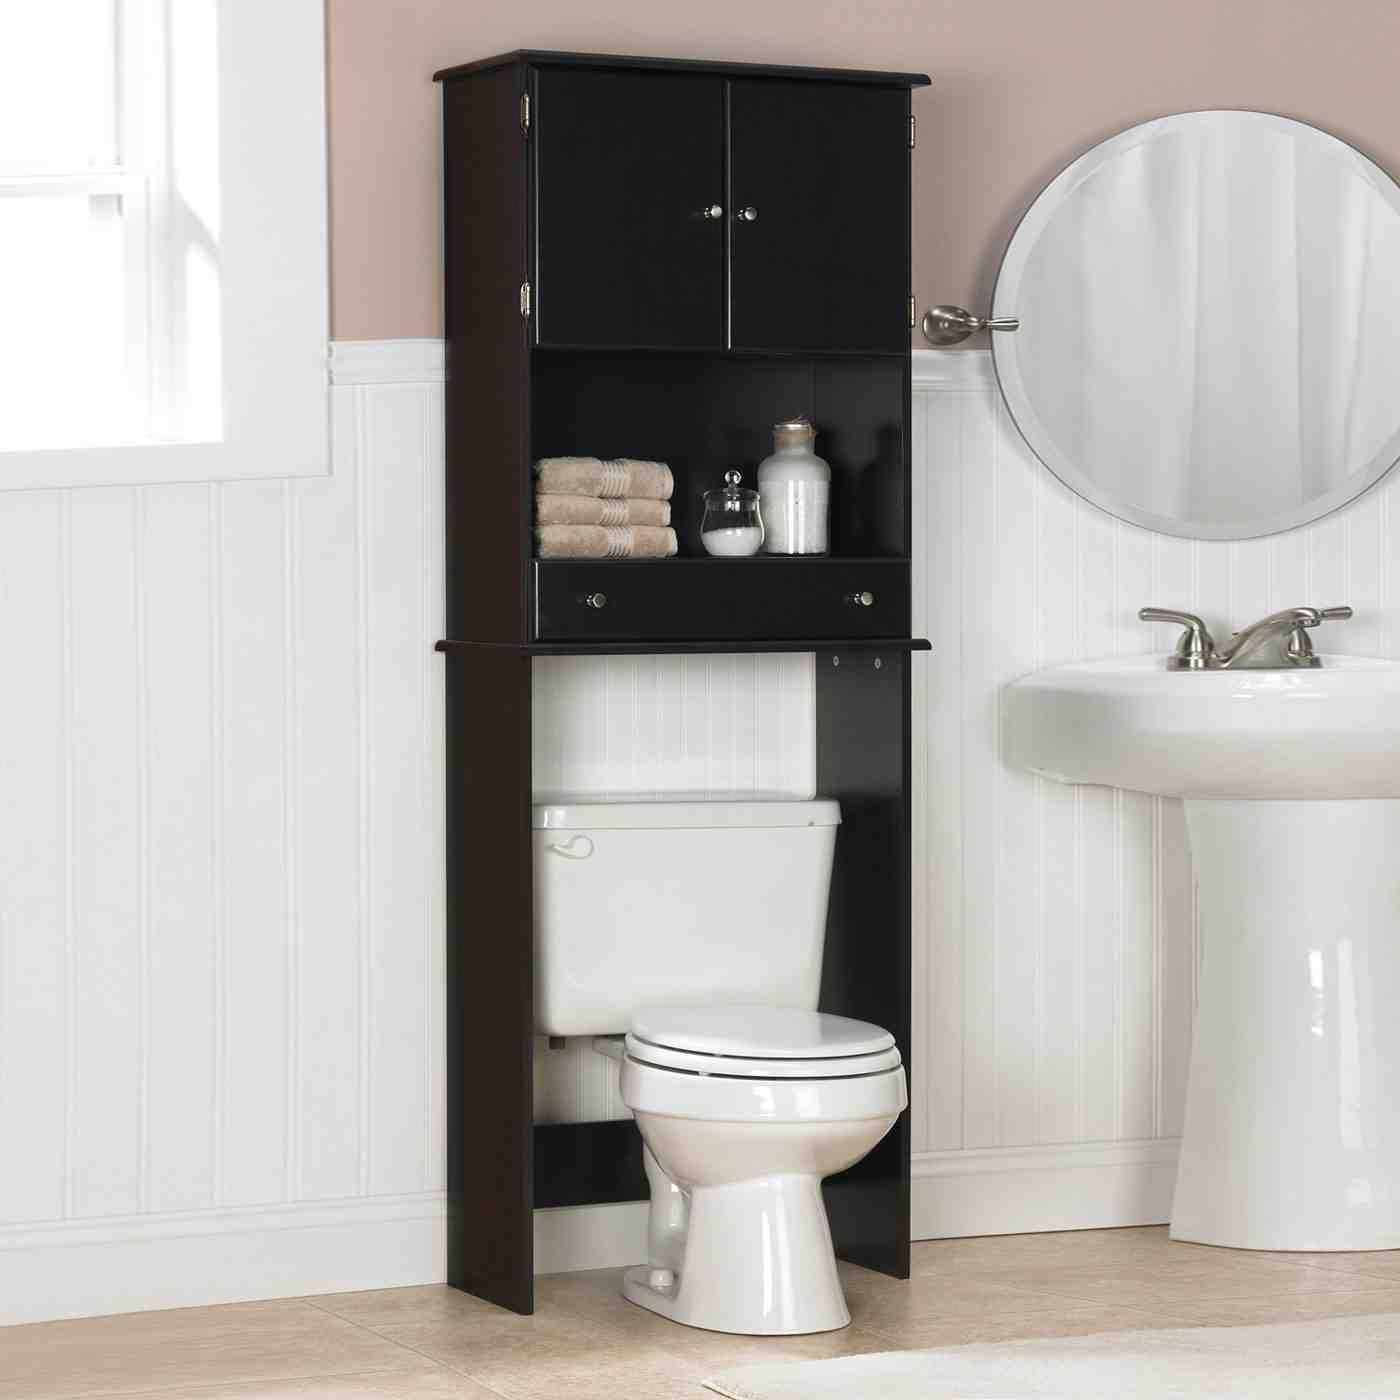 Black Bathroom Storage Cabinet Bathroom Storage Cabinets inside sizing 1400 X 1400